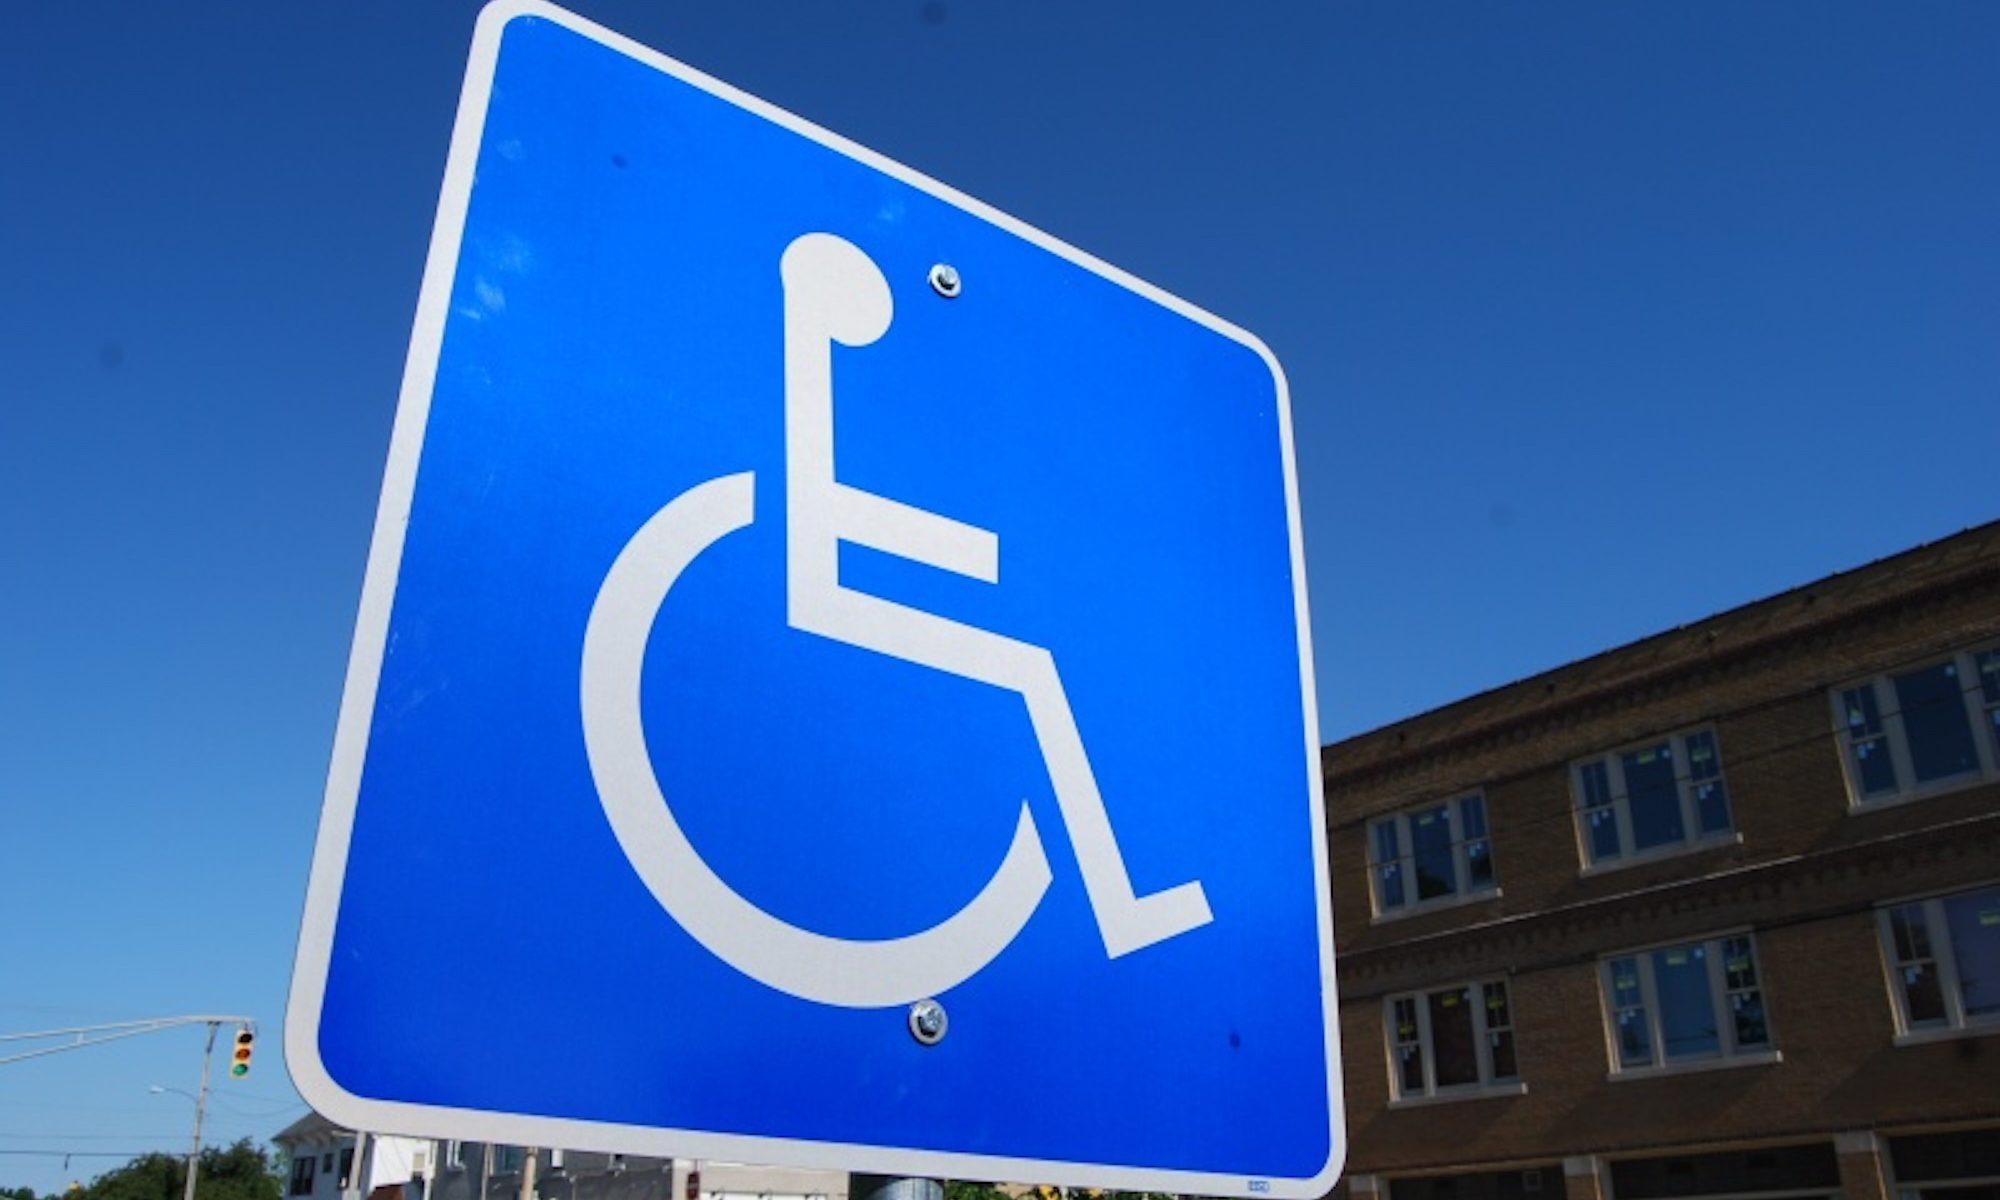 Handicap sign CC-by Steve Johnson https://flic.kr/p/82pNuh